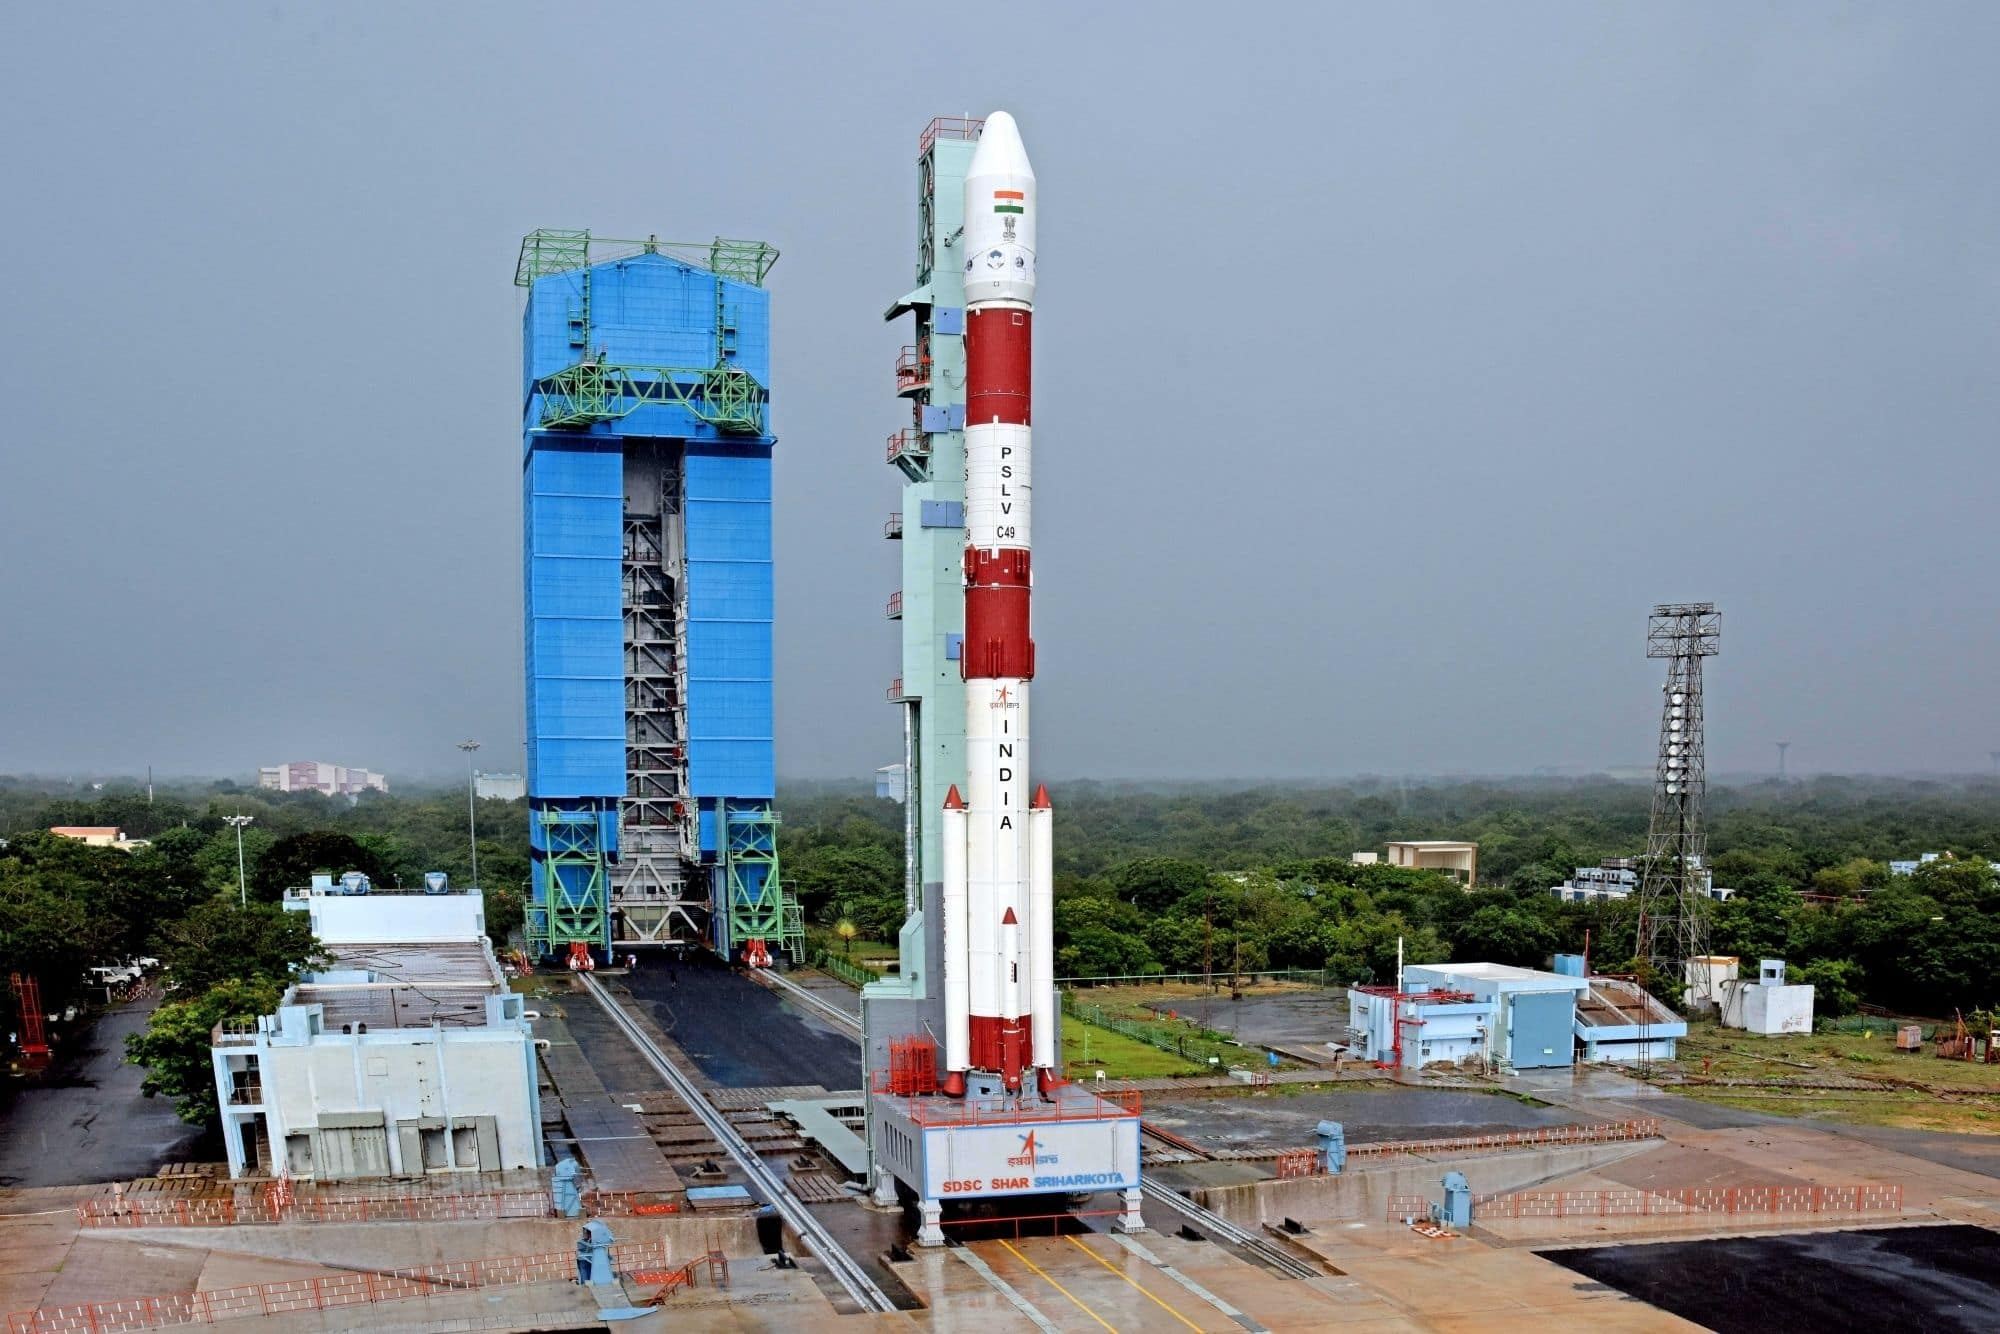 ISRO's PSLV-C51 Rocket Set to Blast Off on Sunday Carrying Bhagavad Gita, PM Modi's Photo